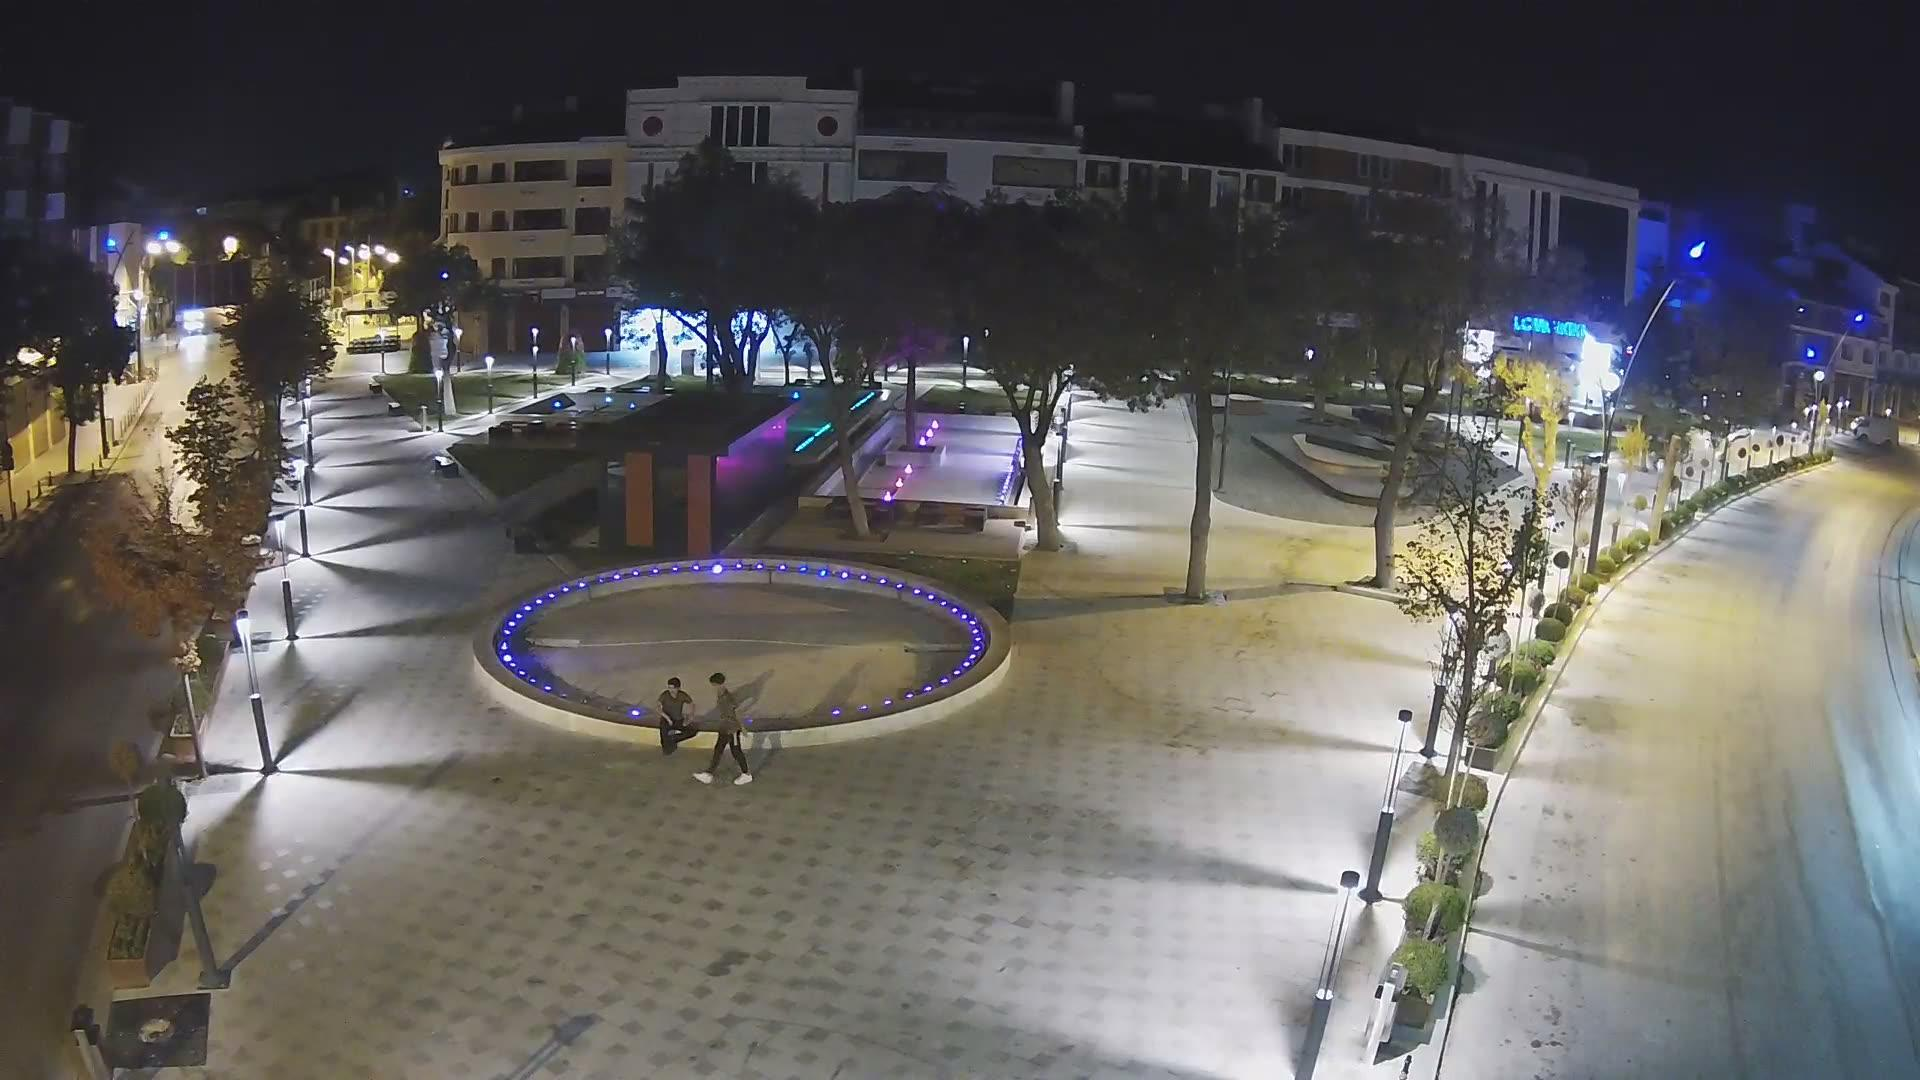 Webkamera Konya: Zafer Meydanı Yer Saati − Zafer Square